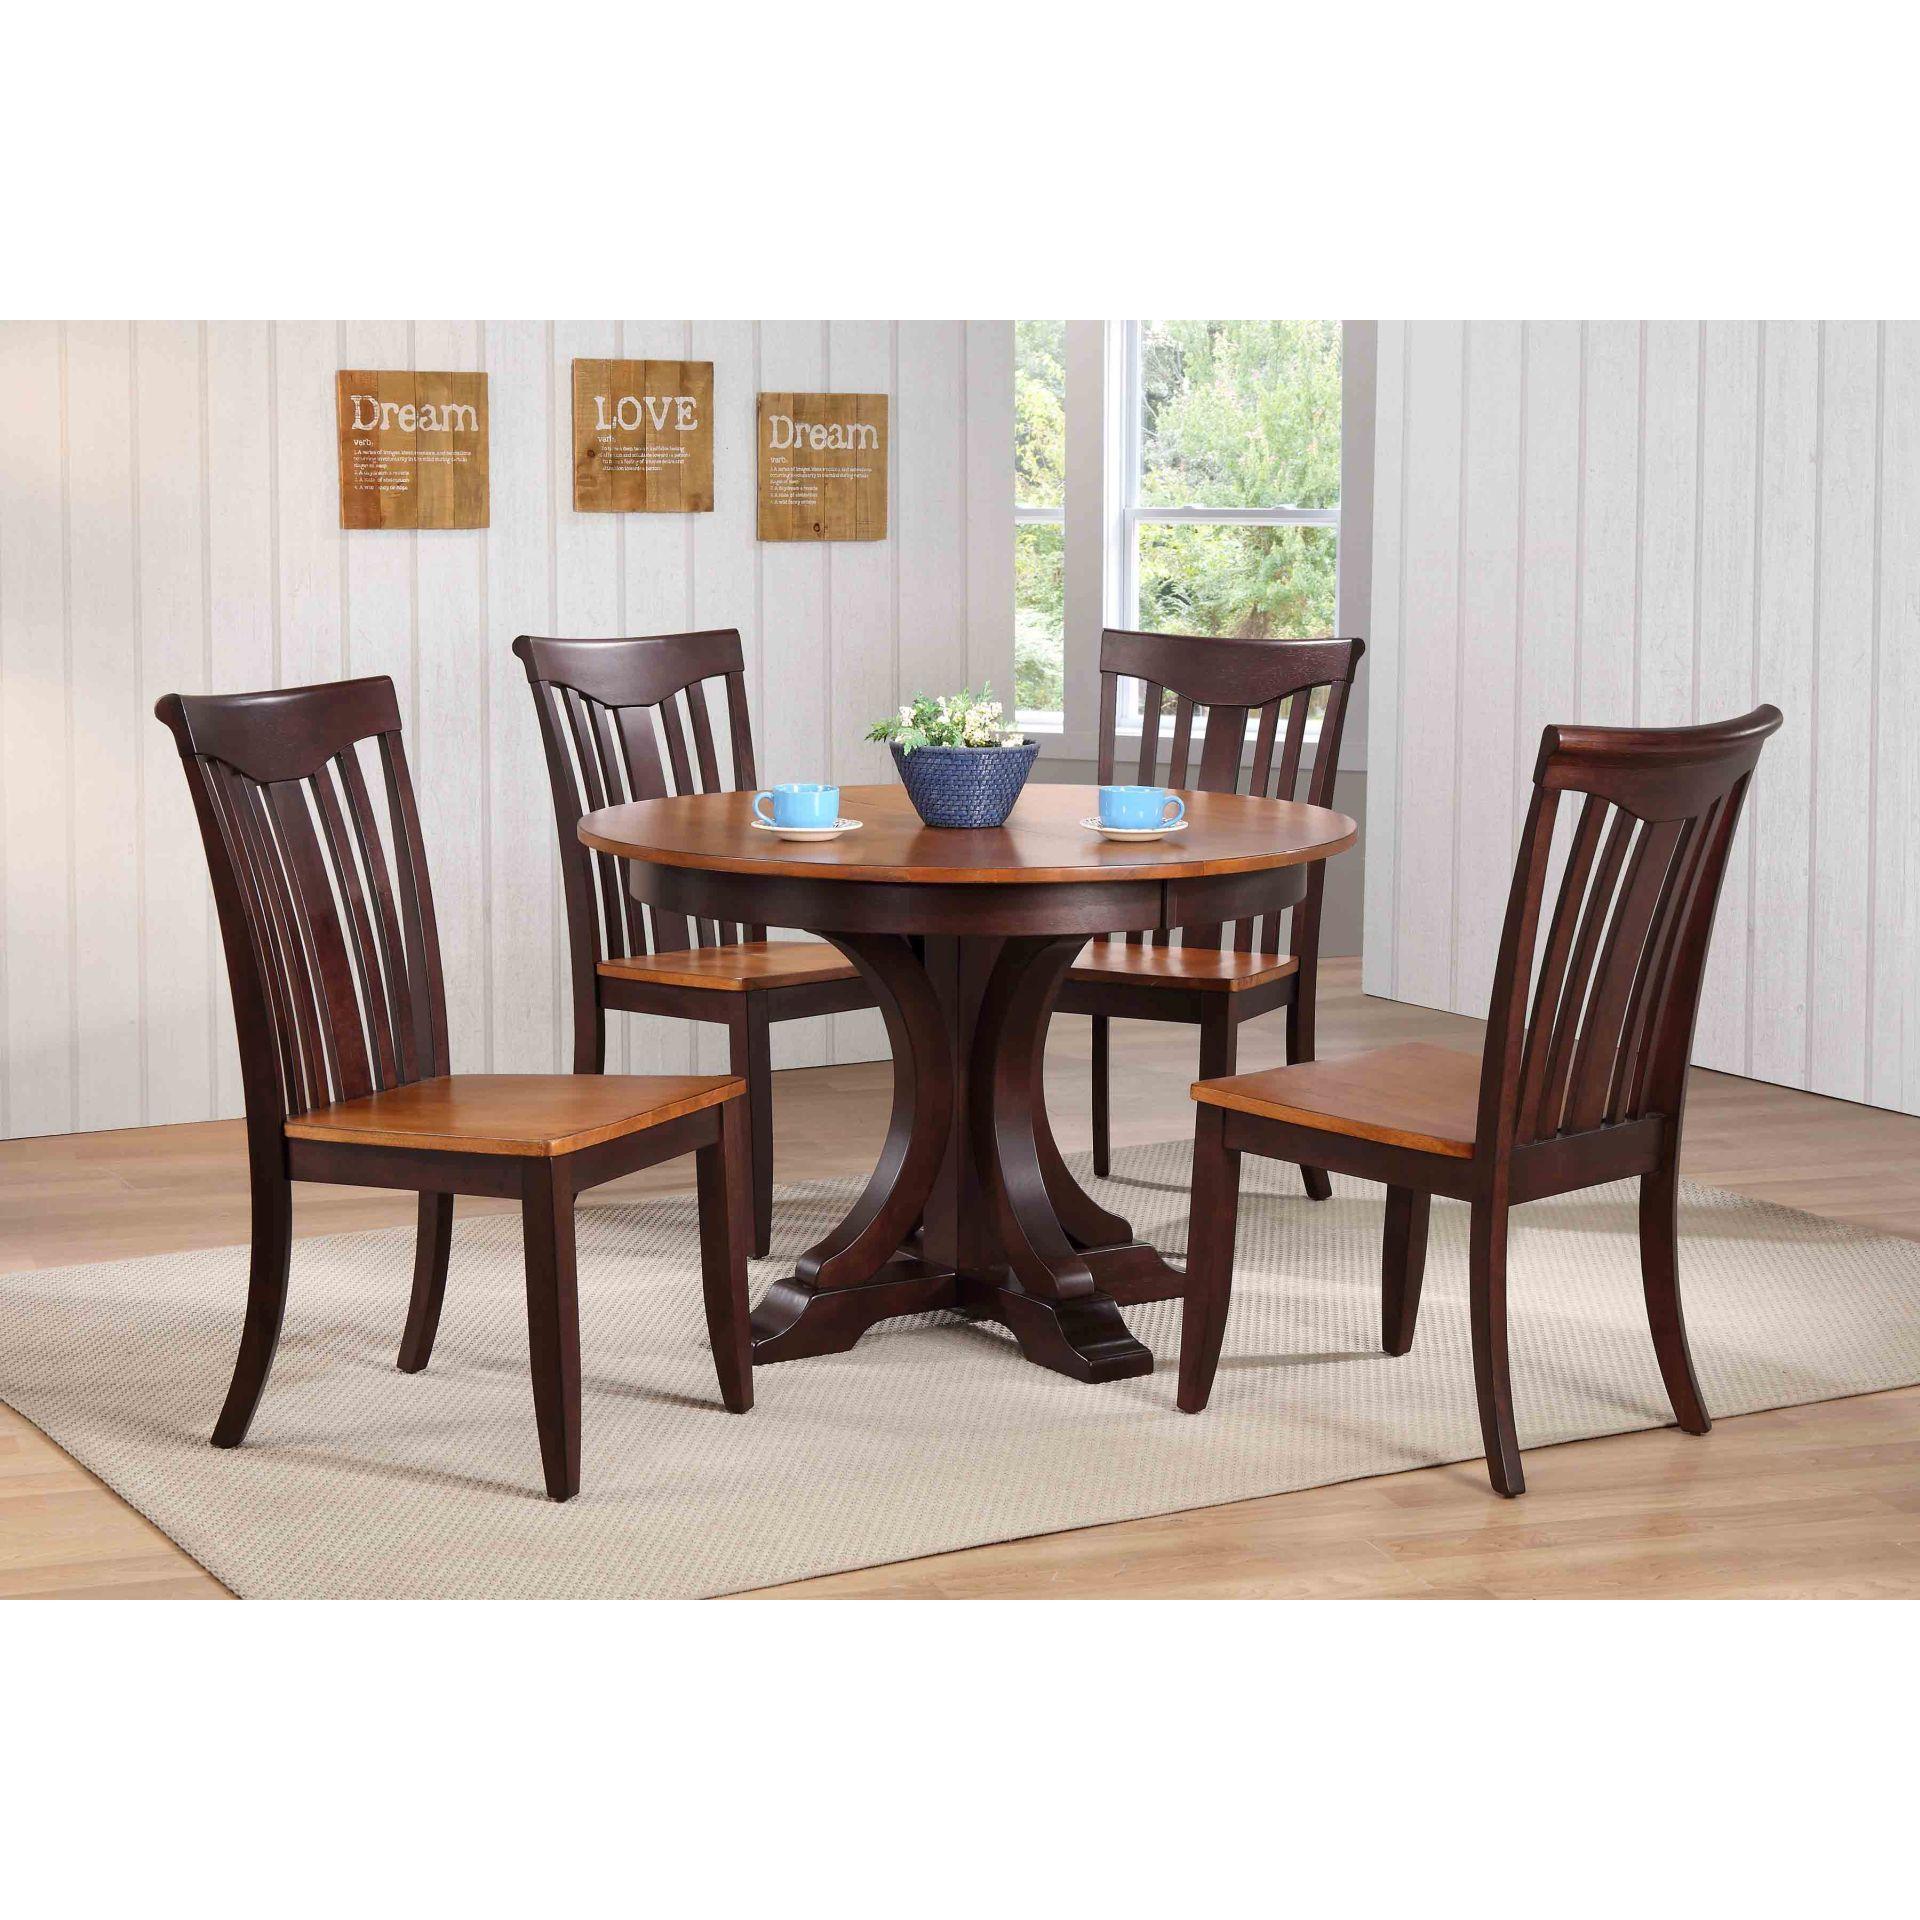 Shop iconic furniture company 45x45x63 deco whiskey mocha modern slat back 5 piece dining set free shipping today overstock com 15053663